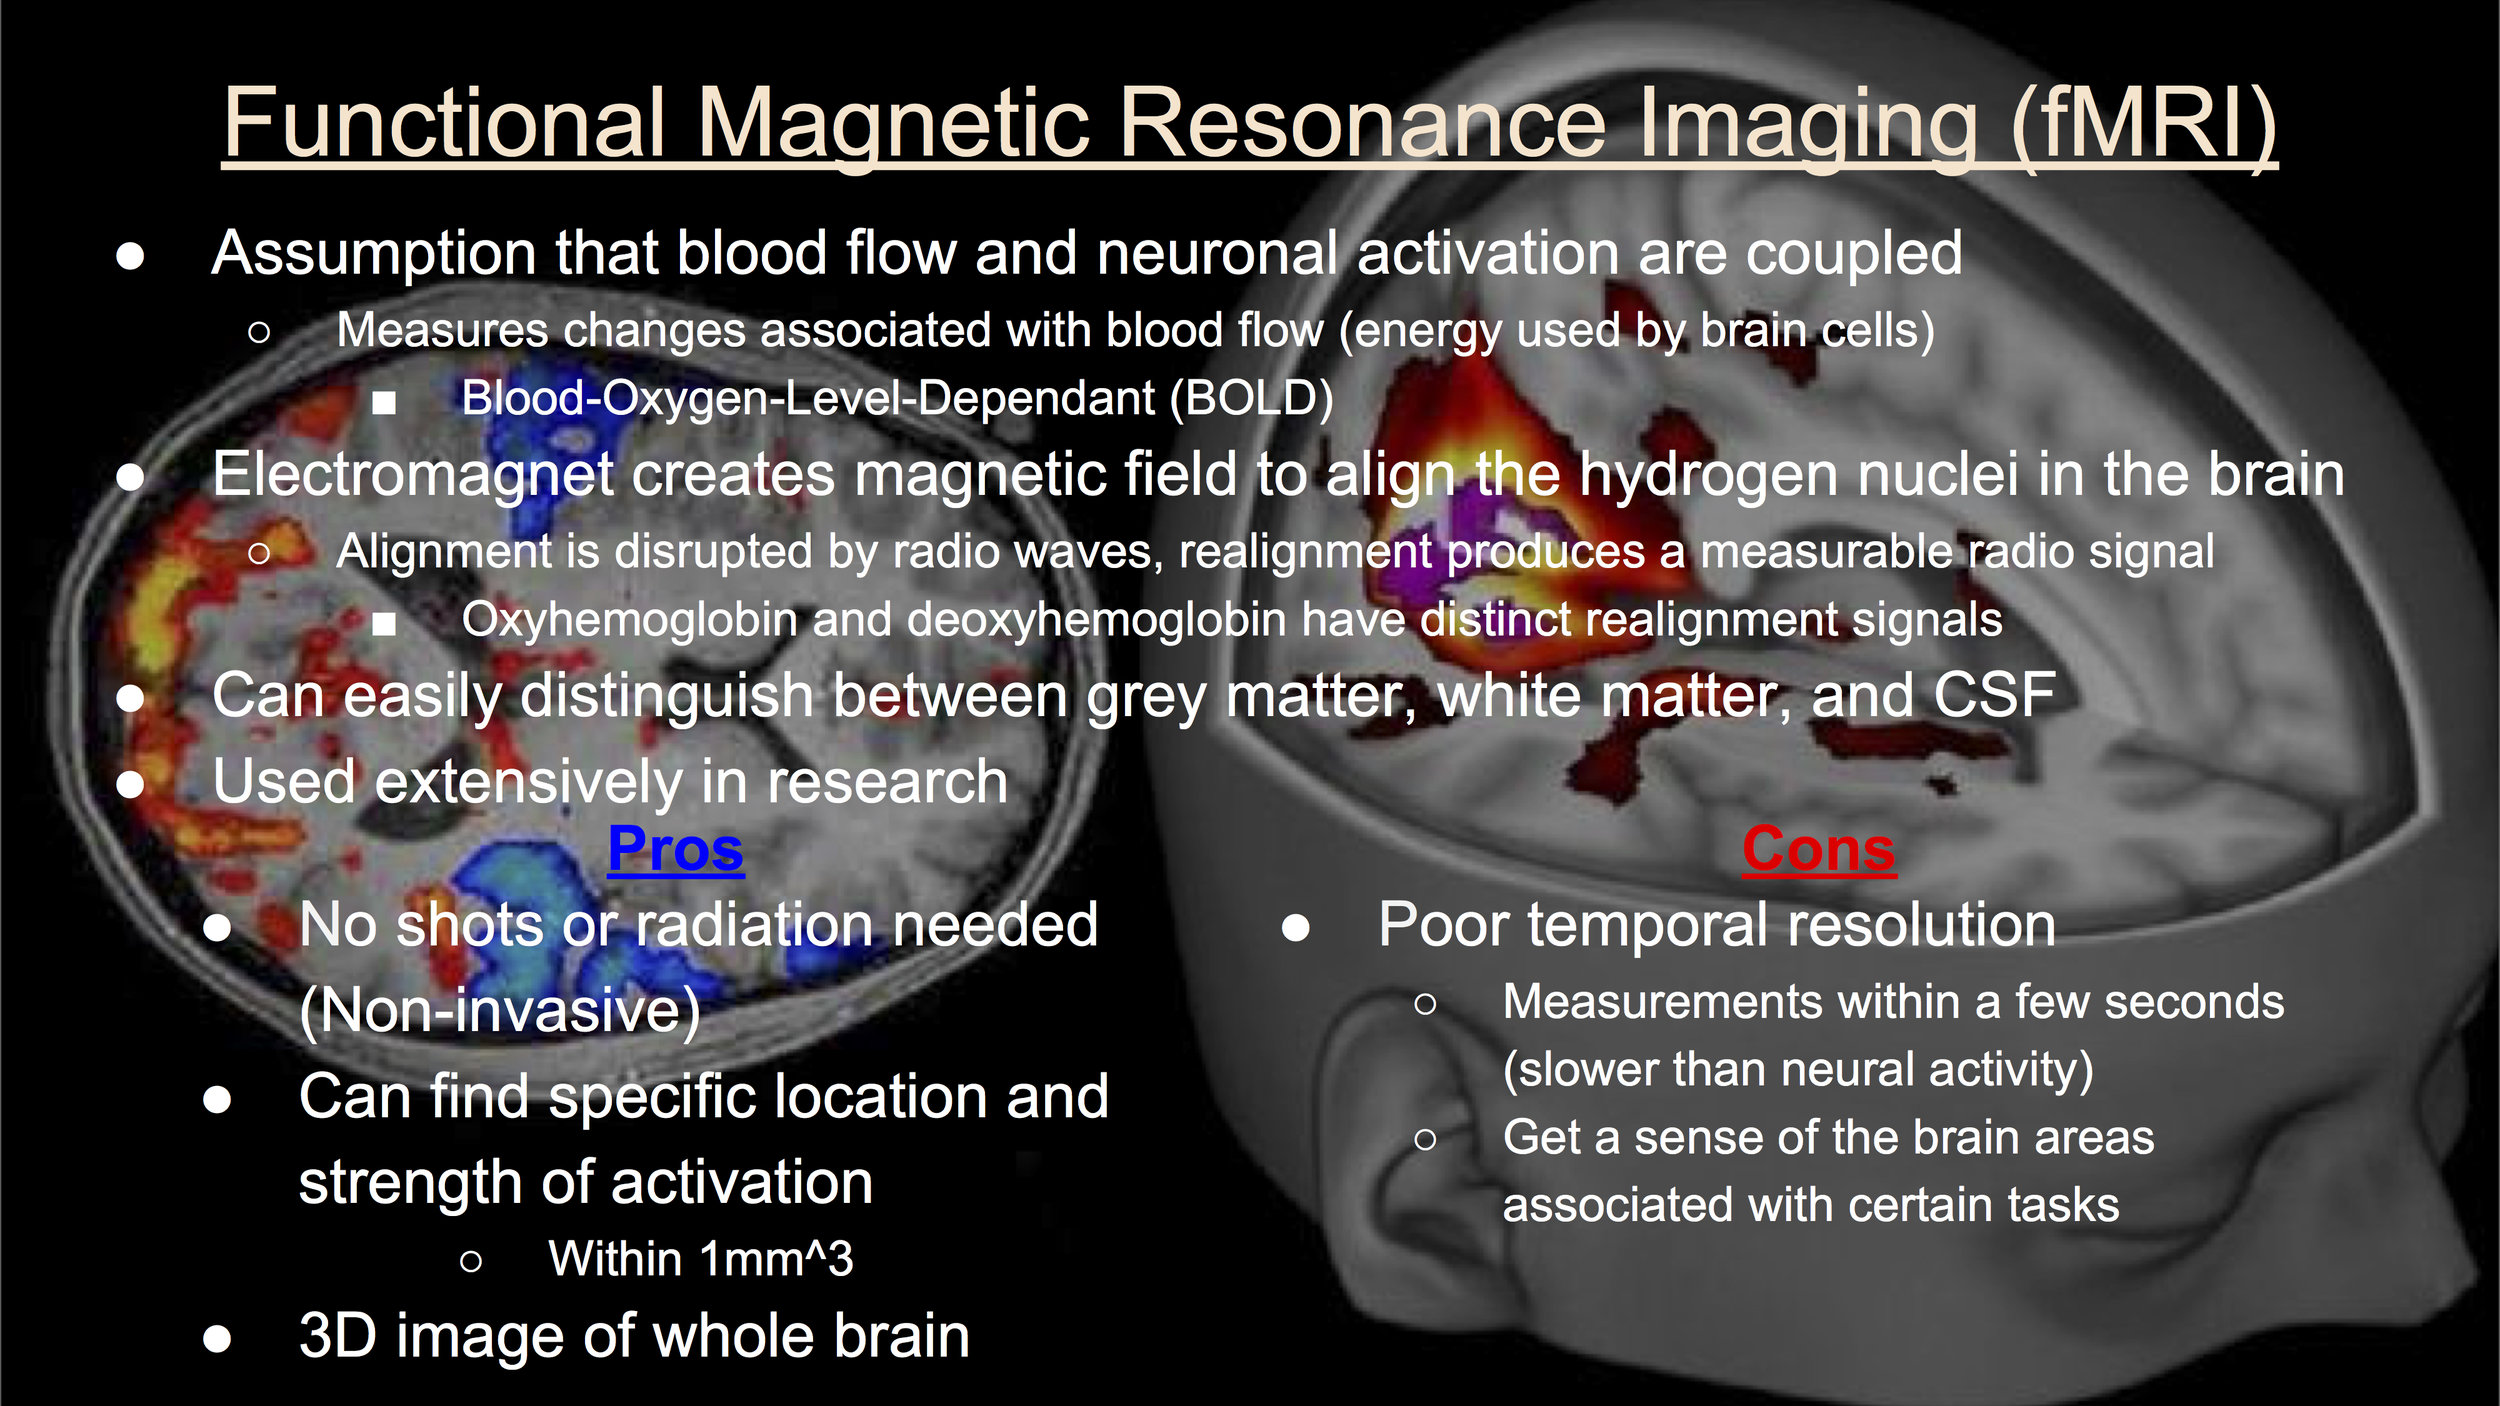 Functional NeuroImaging Techniques (fMRI).jpg